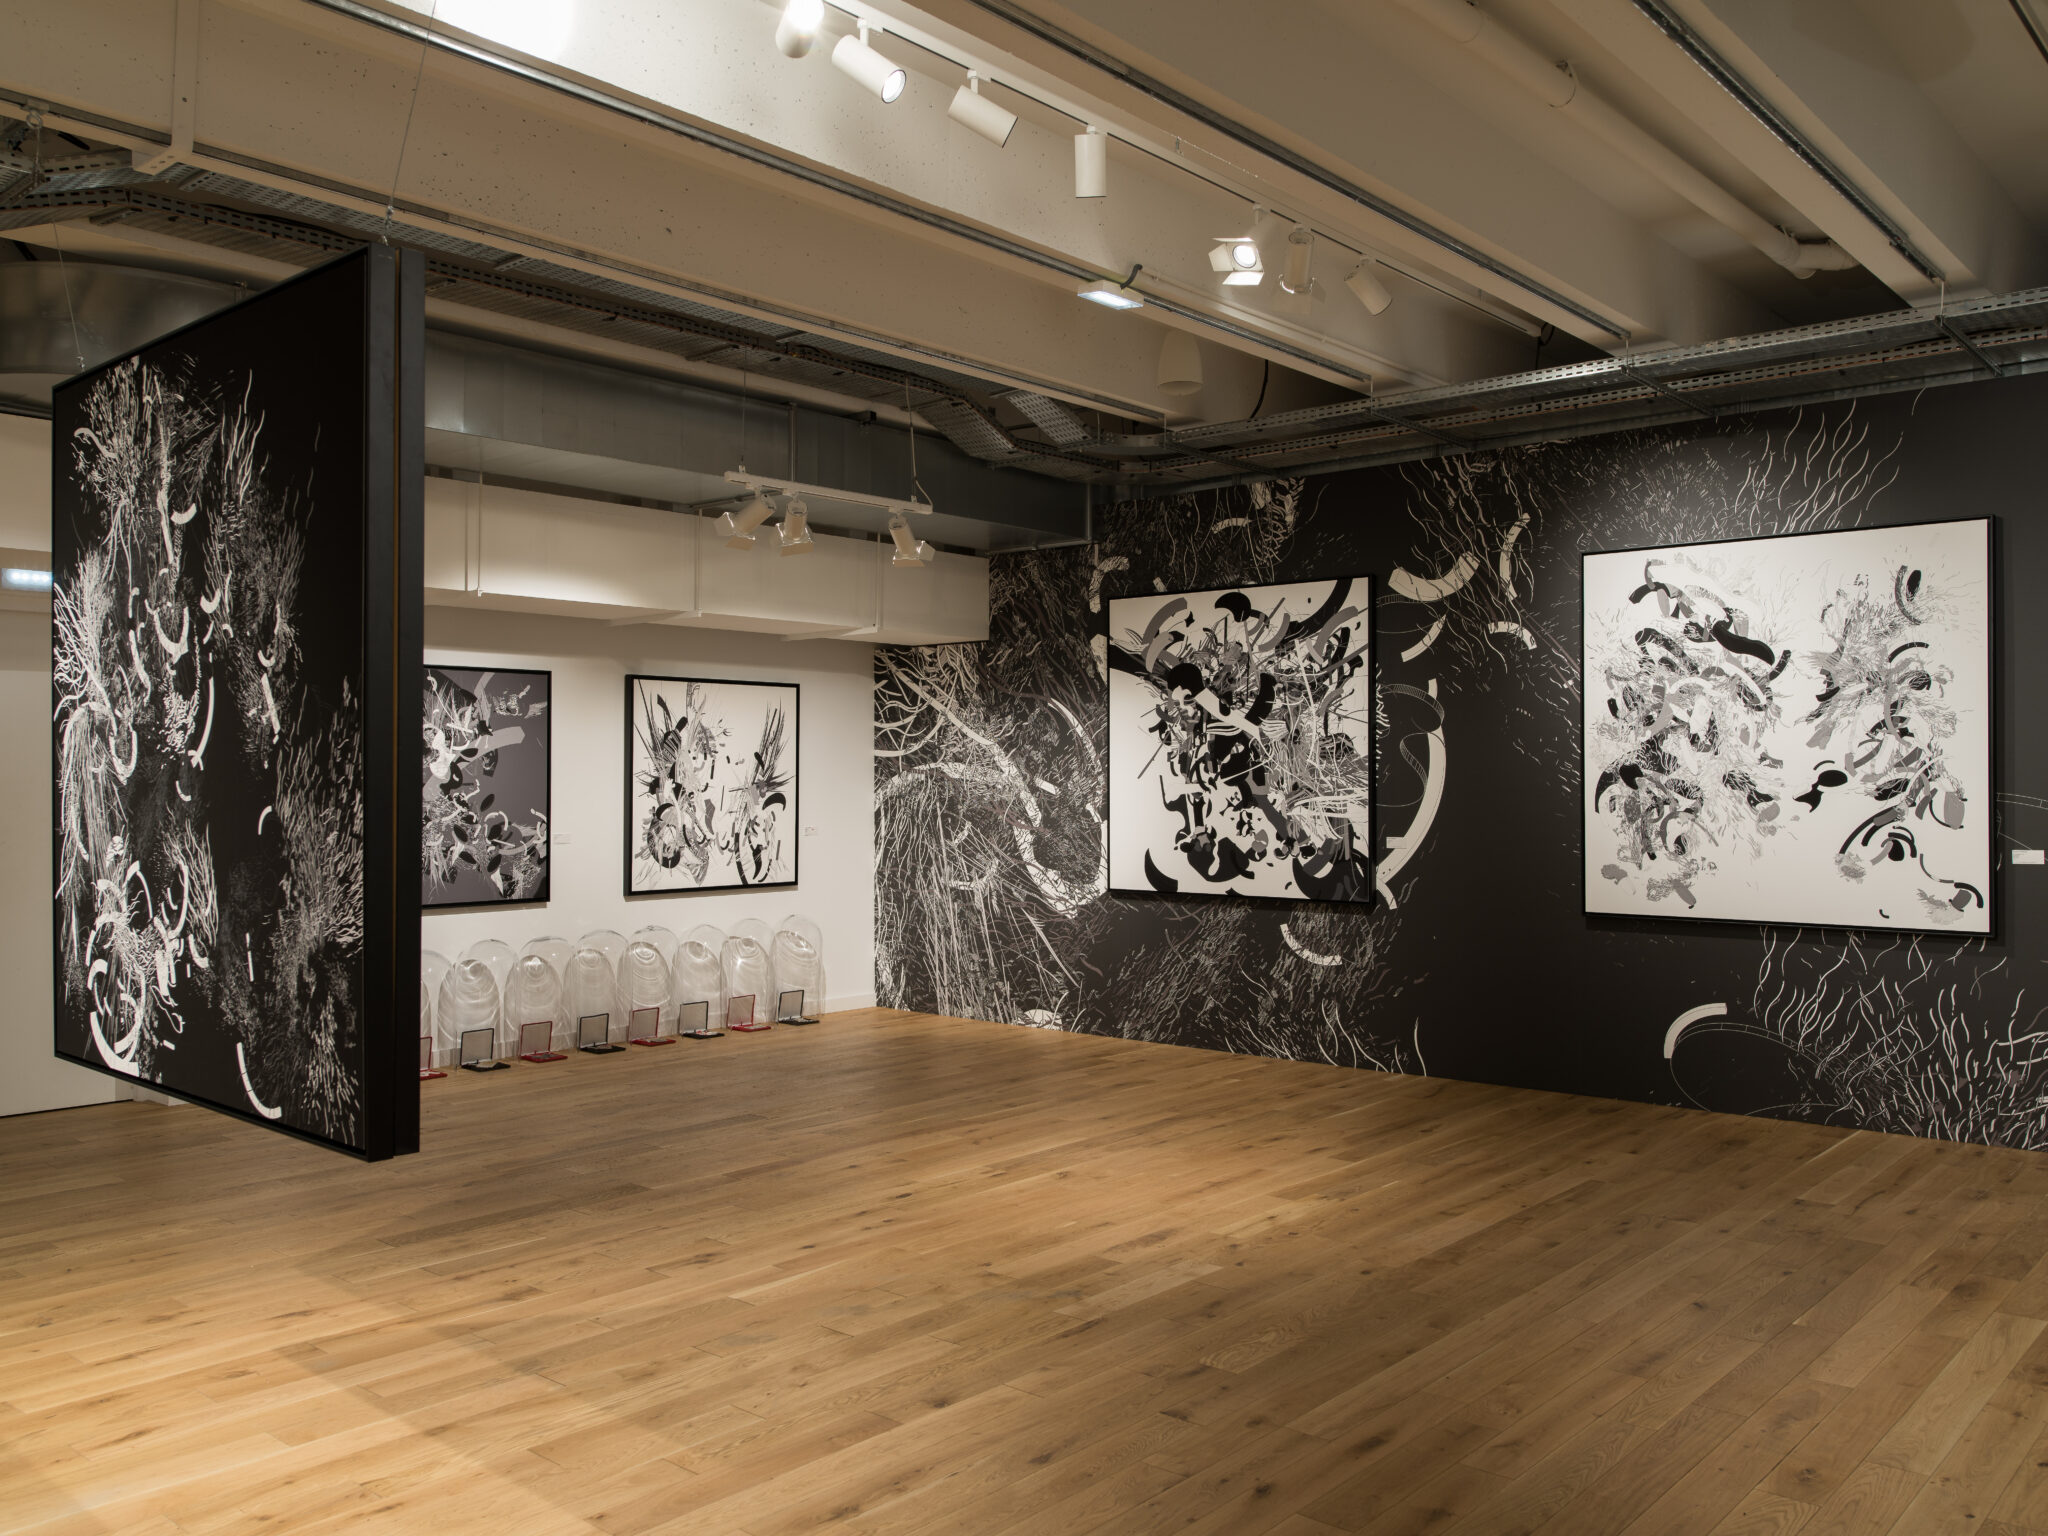 audrey-hatchikian-gallery-flagrant-délire-sacha-haillote-rodolphe-barsikian-exposition-paris